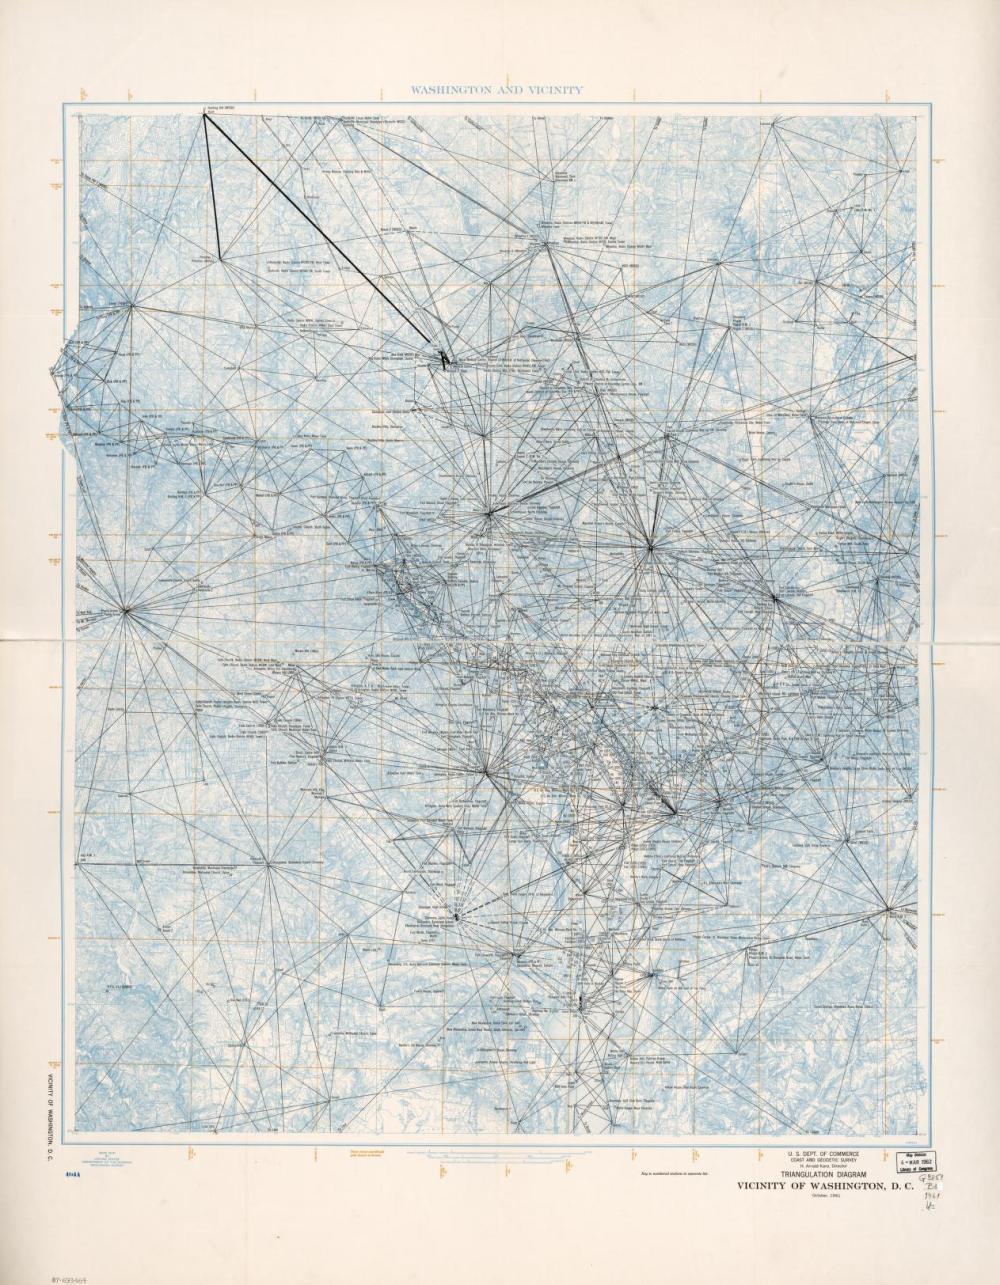 medium resolution of triangulation diagram vicinity of washington d c october 1961 library of congress